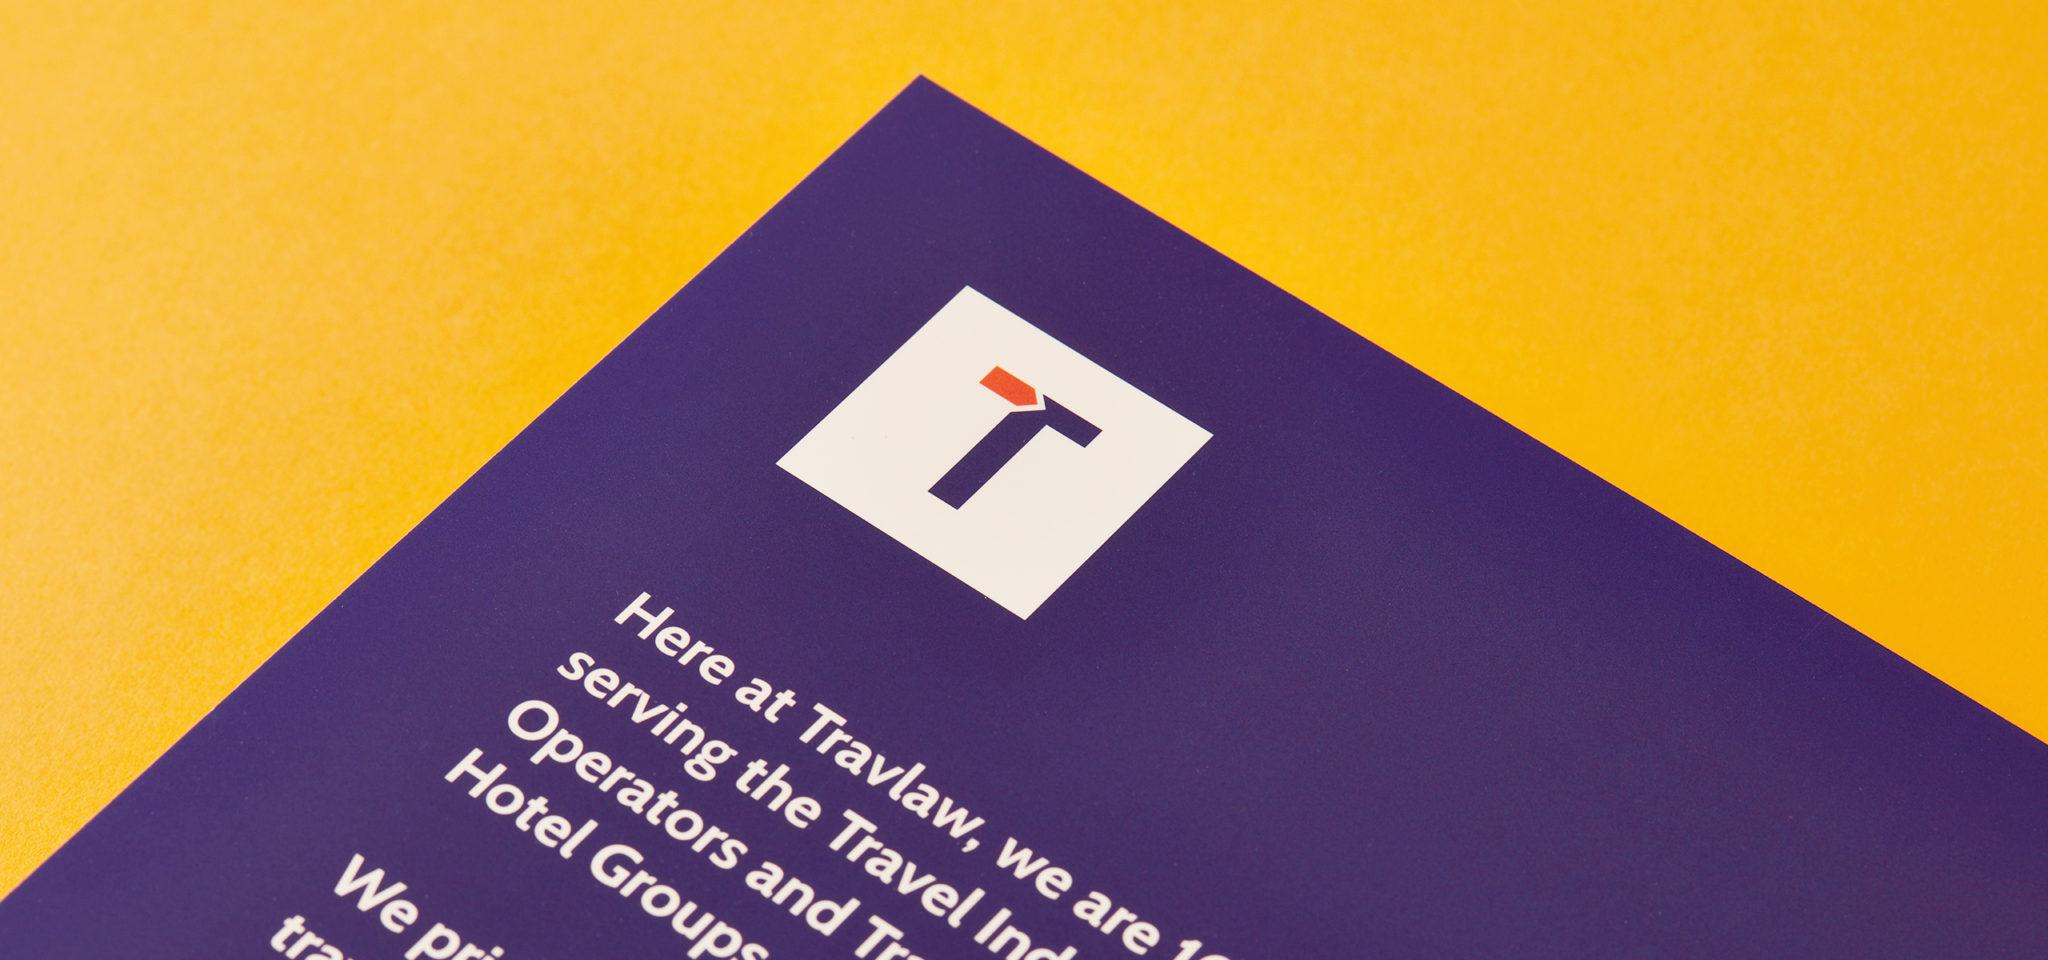 Travlaw Branding, Folder Design and Print, Close Up